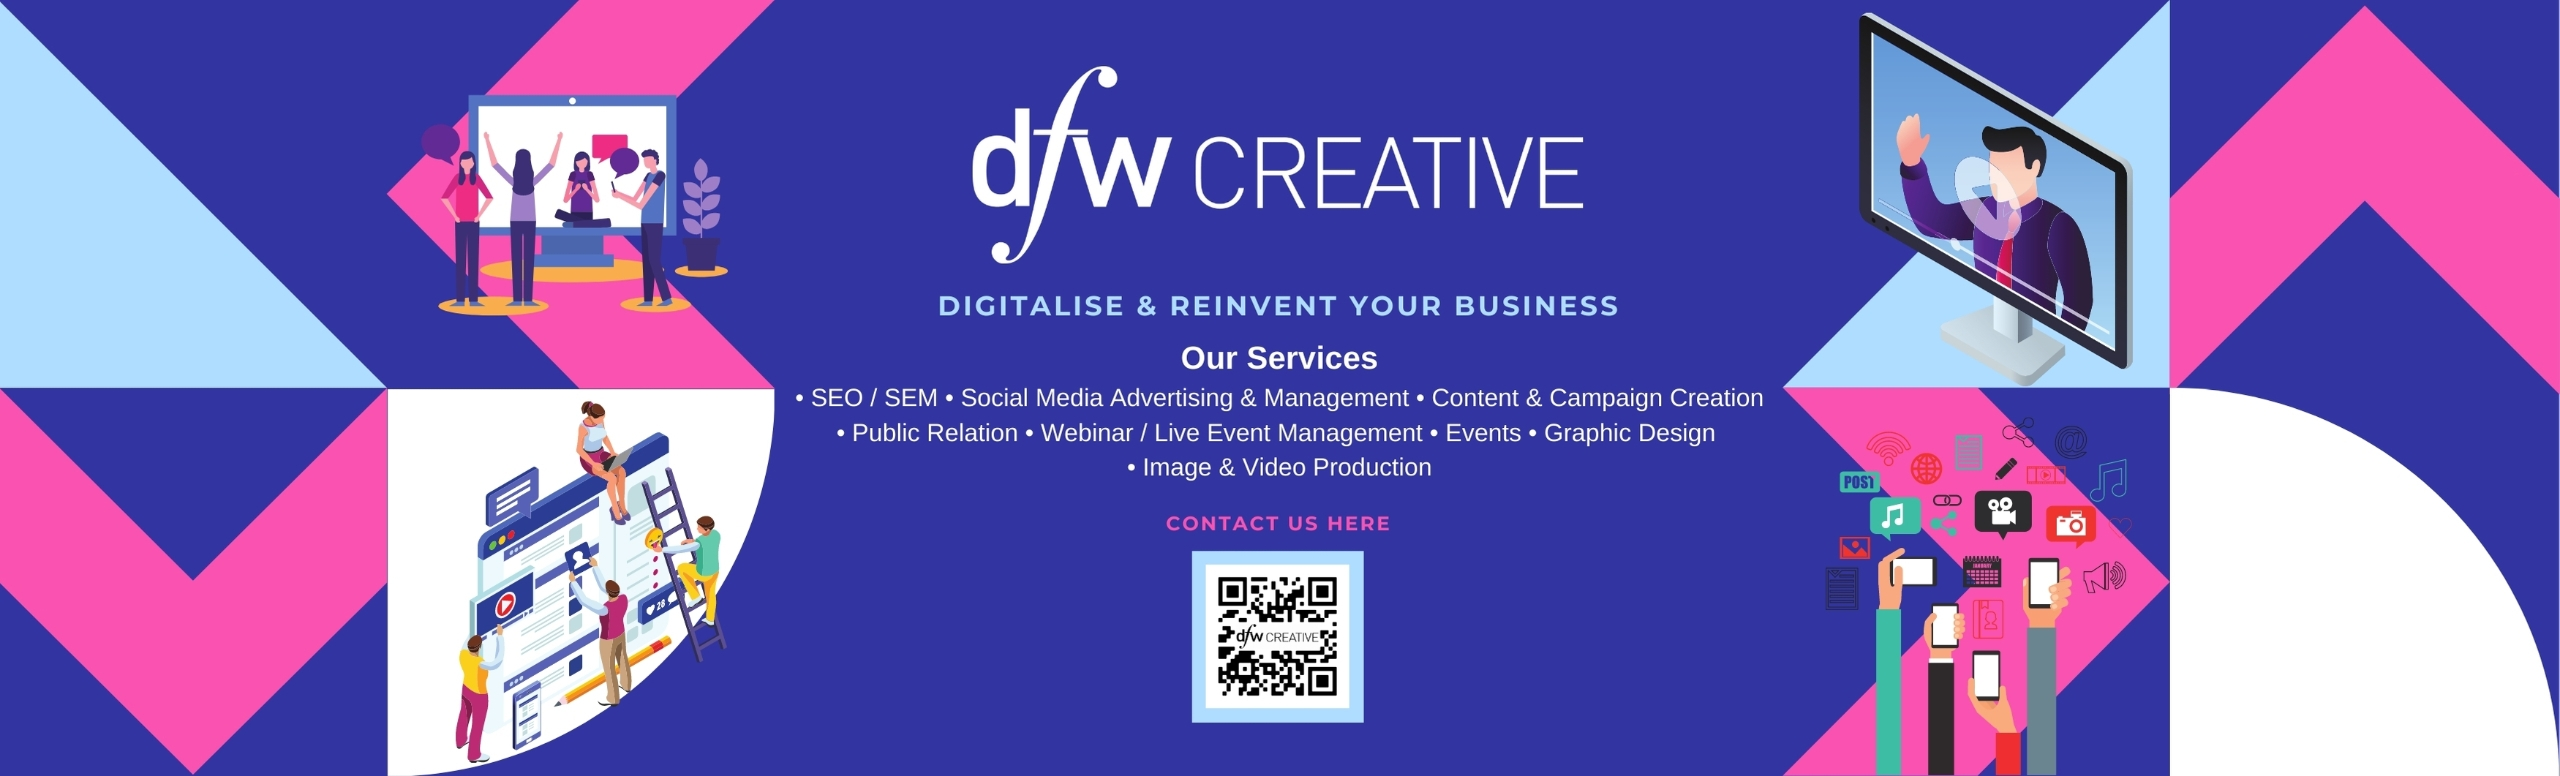 DFW Crea (@dfwcreative) Cover Image